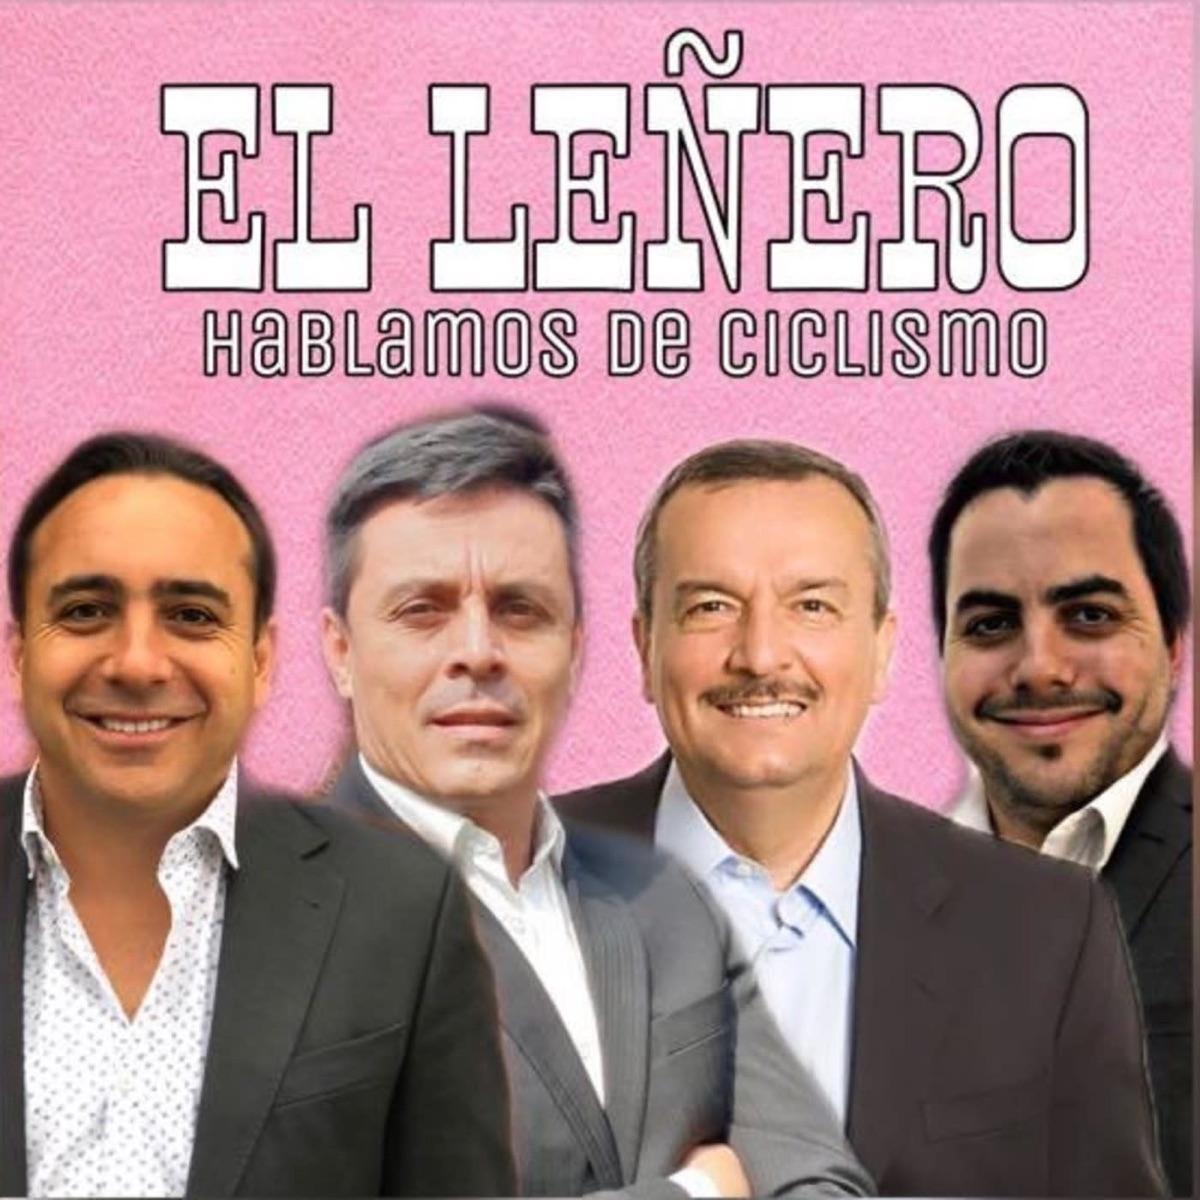 El Leñero